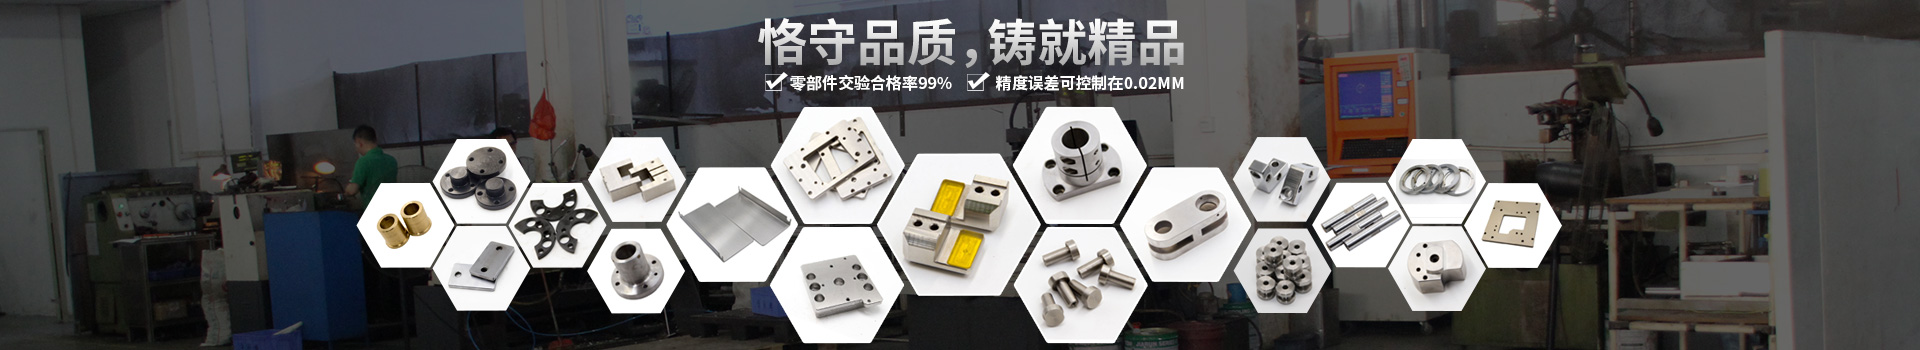 CNC精密机械加工,精密机械零件加工,CNC加工定制,深圳CNC加工厂家——恪守品质,铸就精品